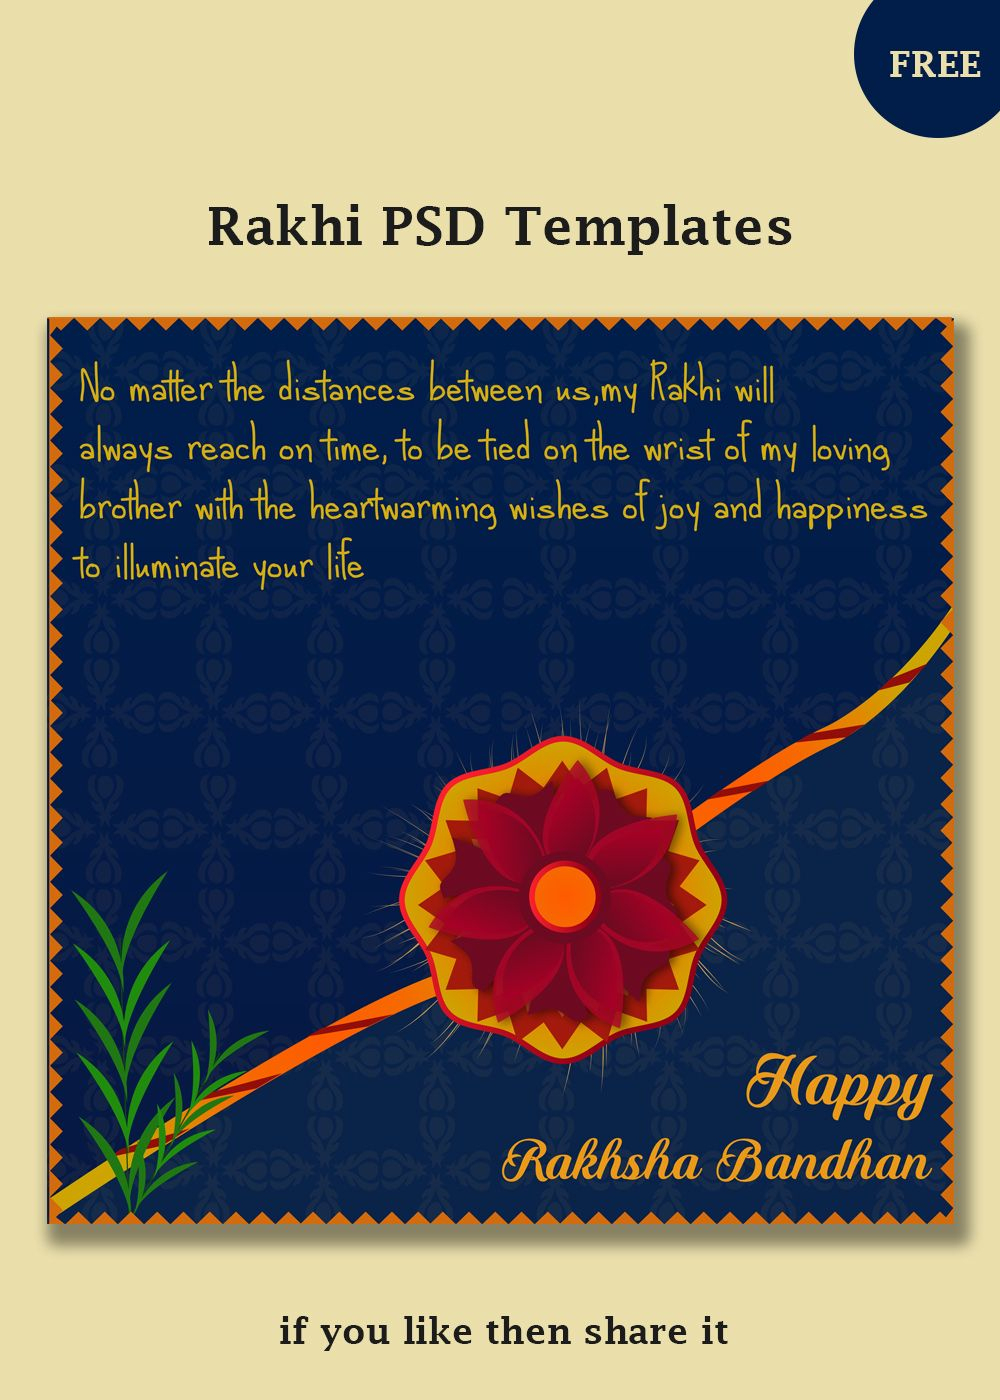 Free Rakhi Vector Templates | Social Post Design | Templates, Rakhi - Free Online Printable Rakhi Cards